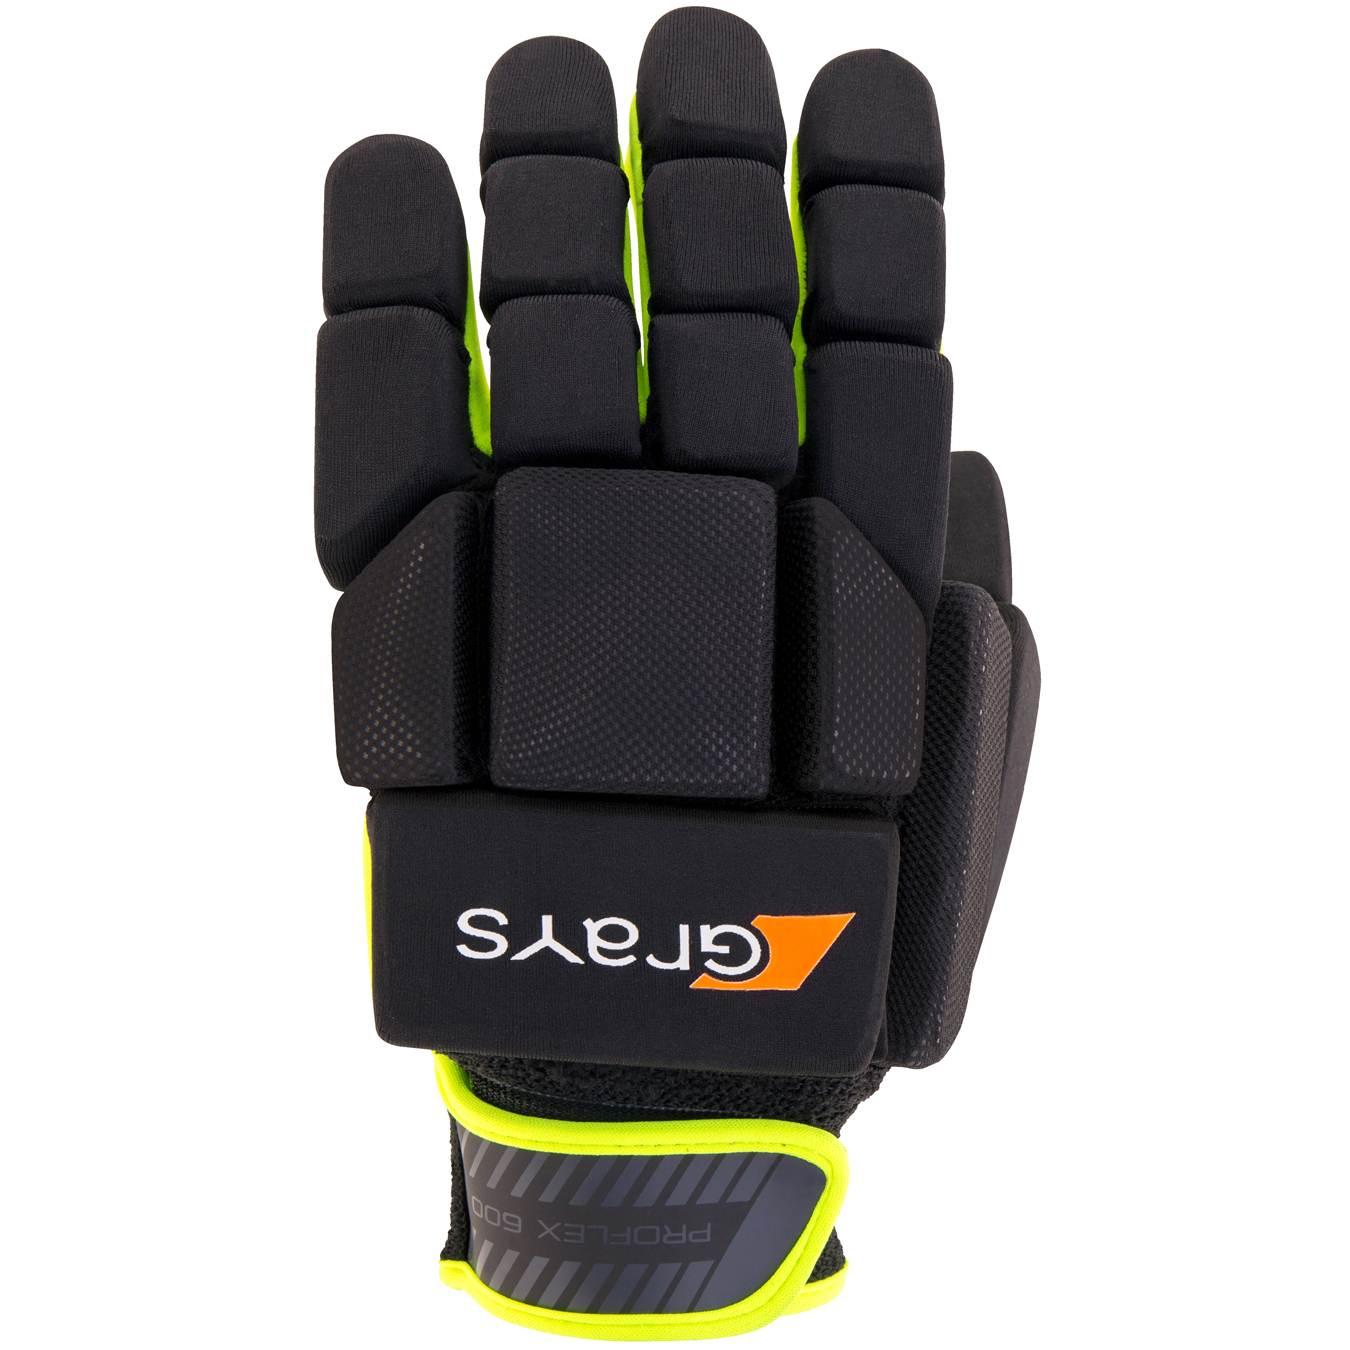 Grays rukavice PROFLEX 600 PRAVÁ L